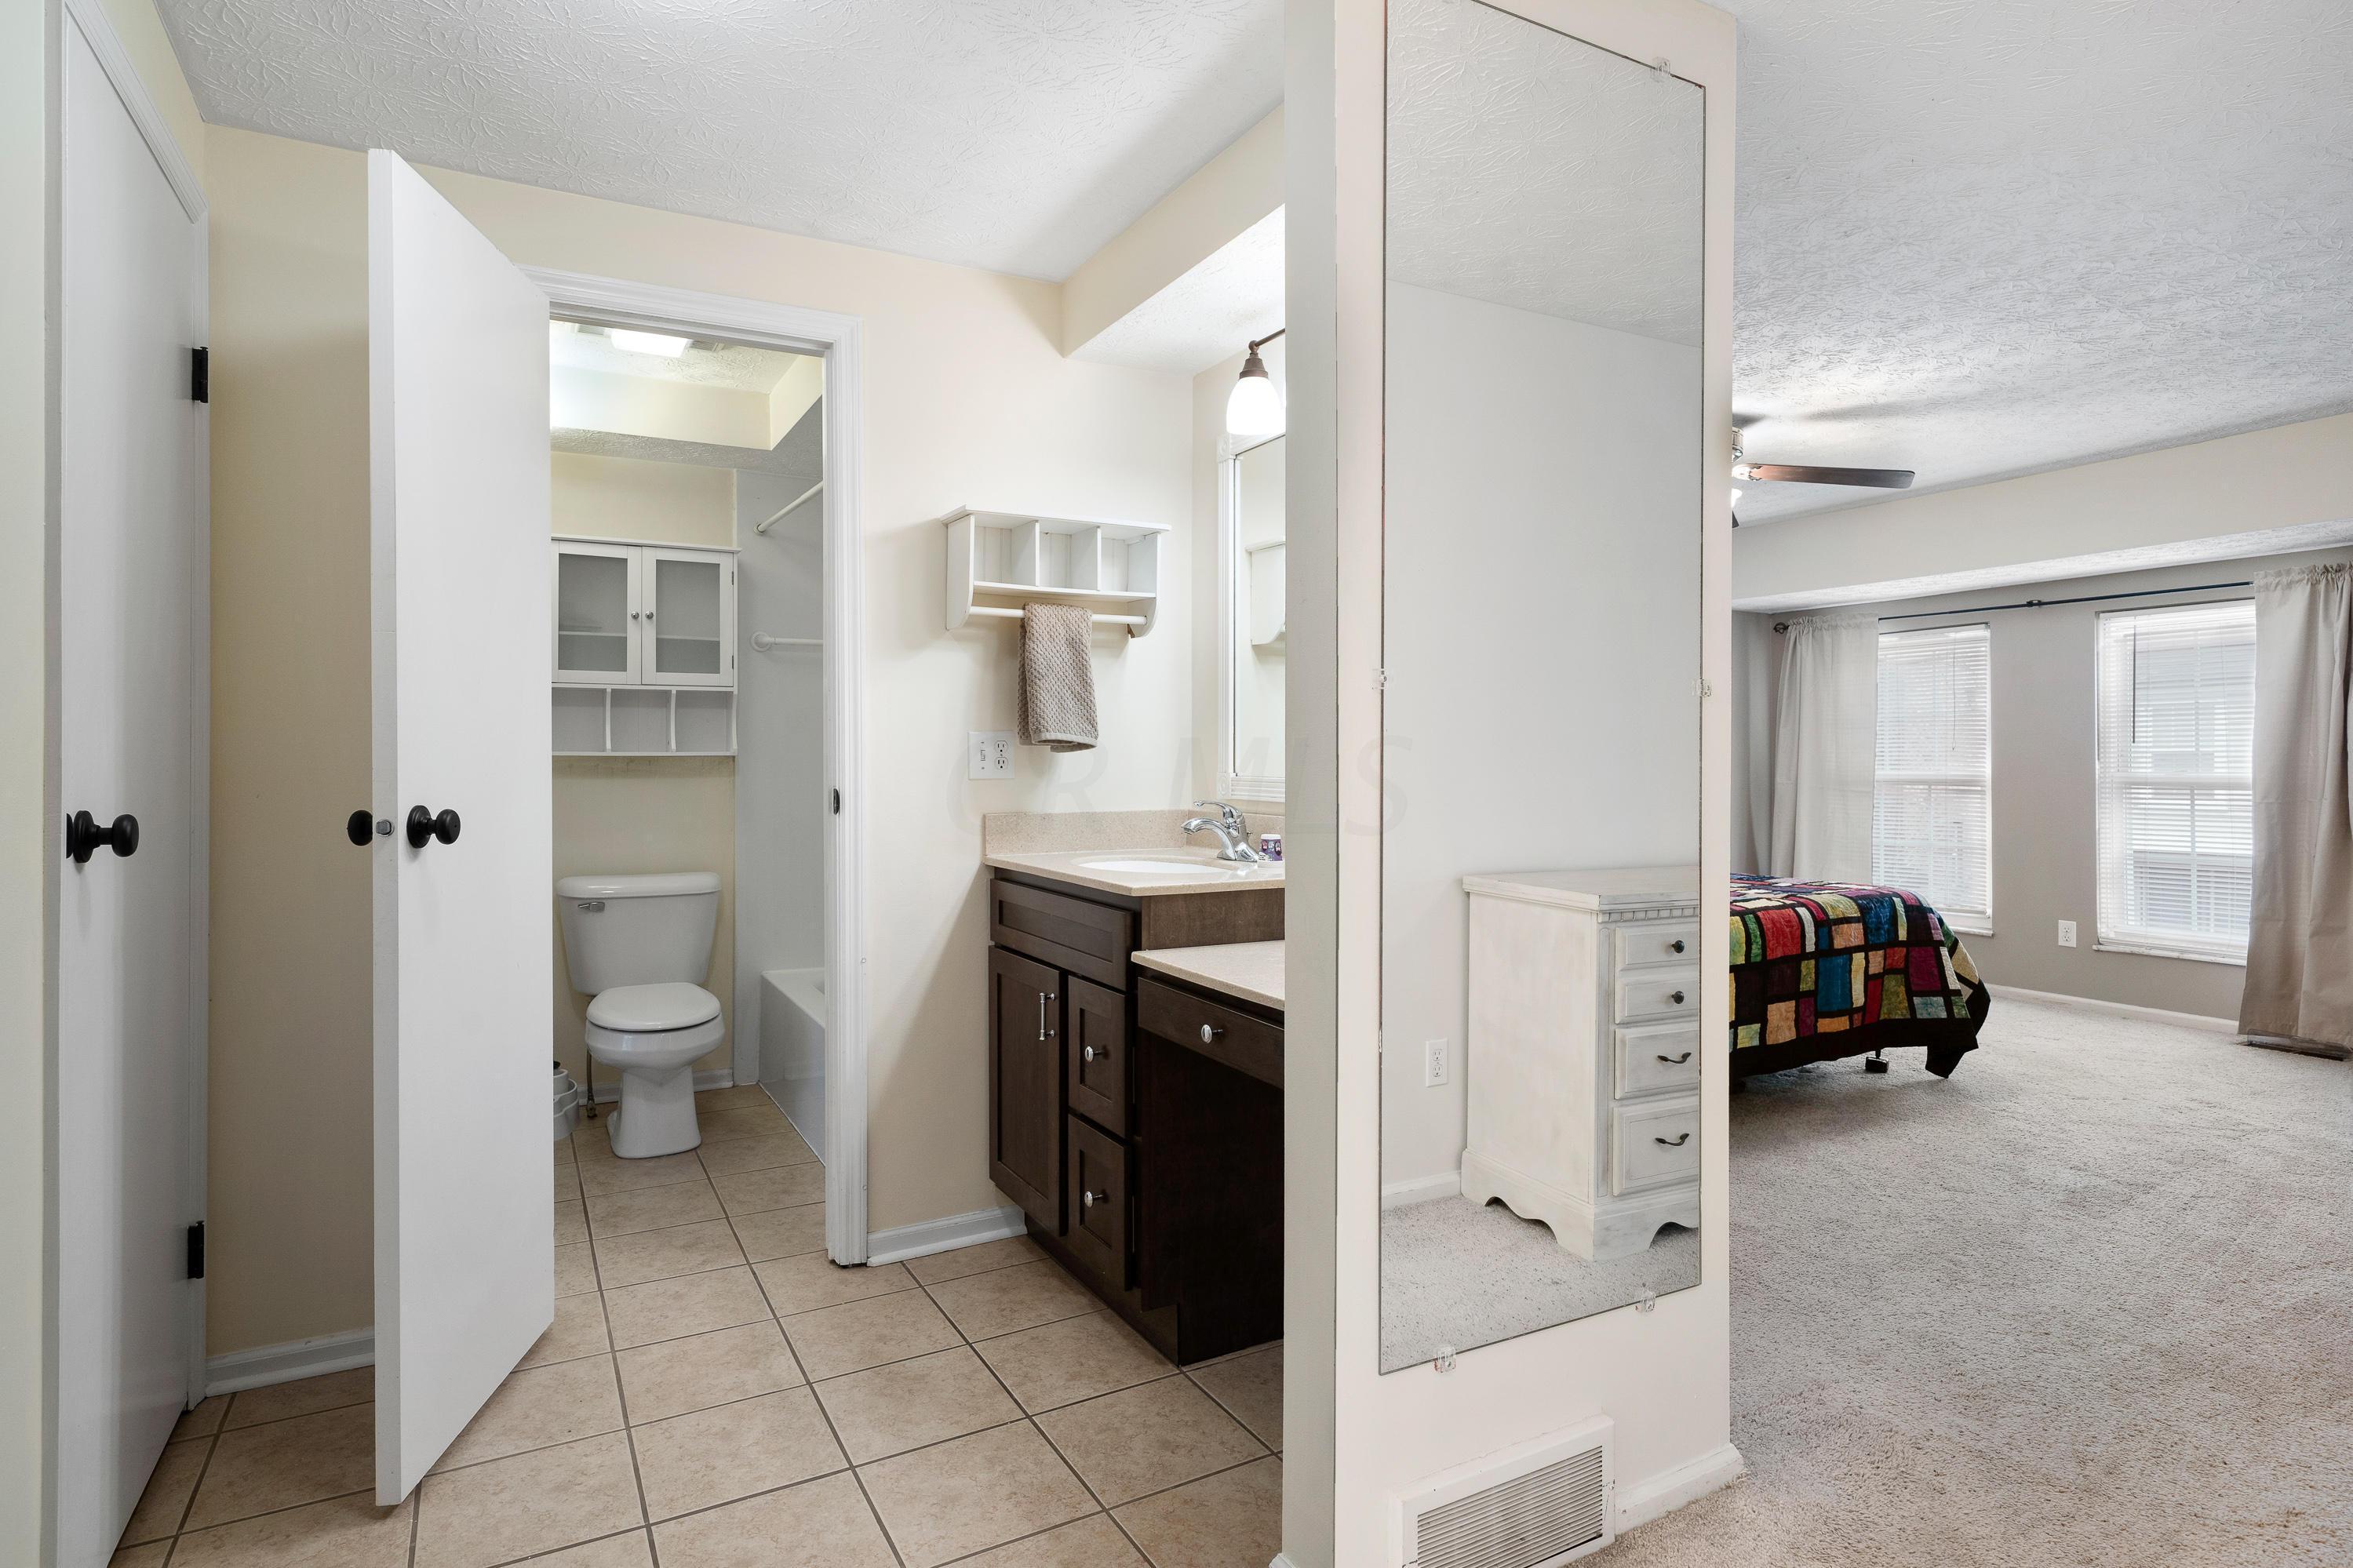 5103 Delancey Street, Columbus, Ohio 43220, 2 Bedrooms Bedrooms, ,2 BathroomsBathrooms,Residential,For Sale,Delancey,221001143